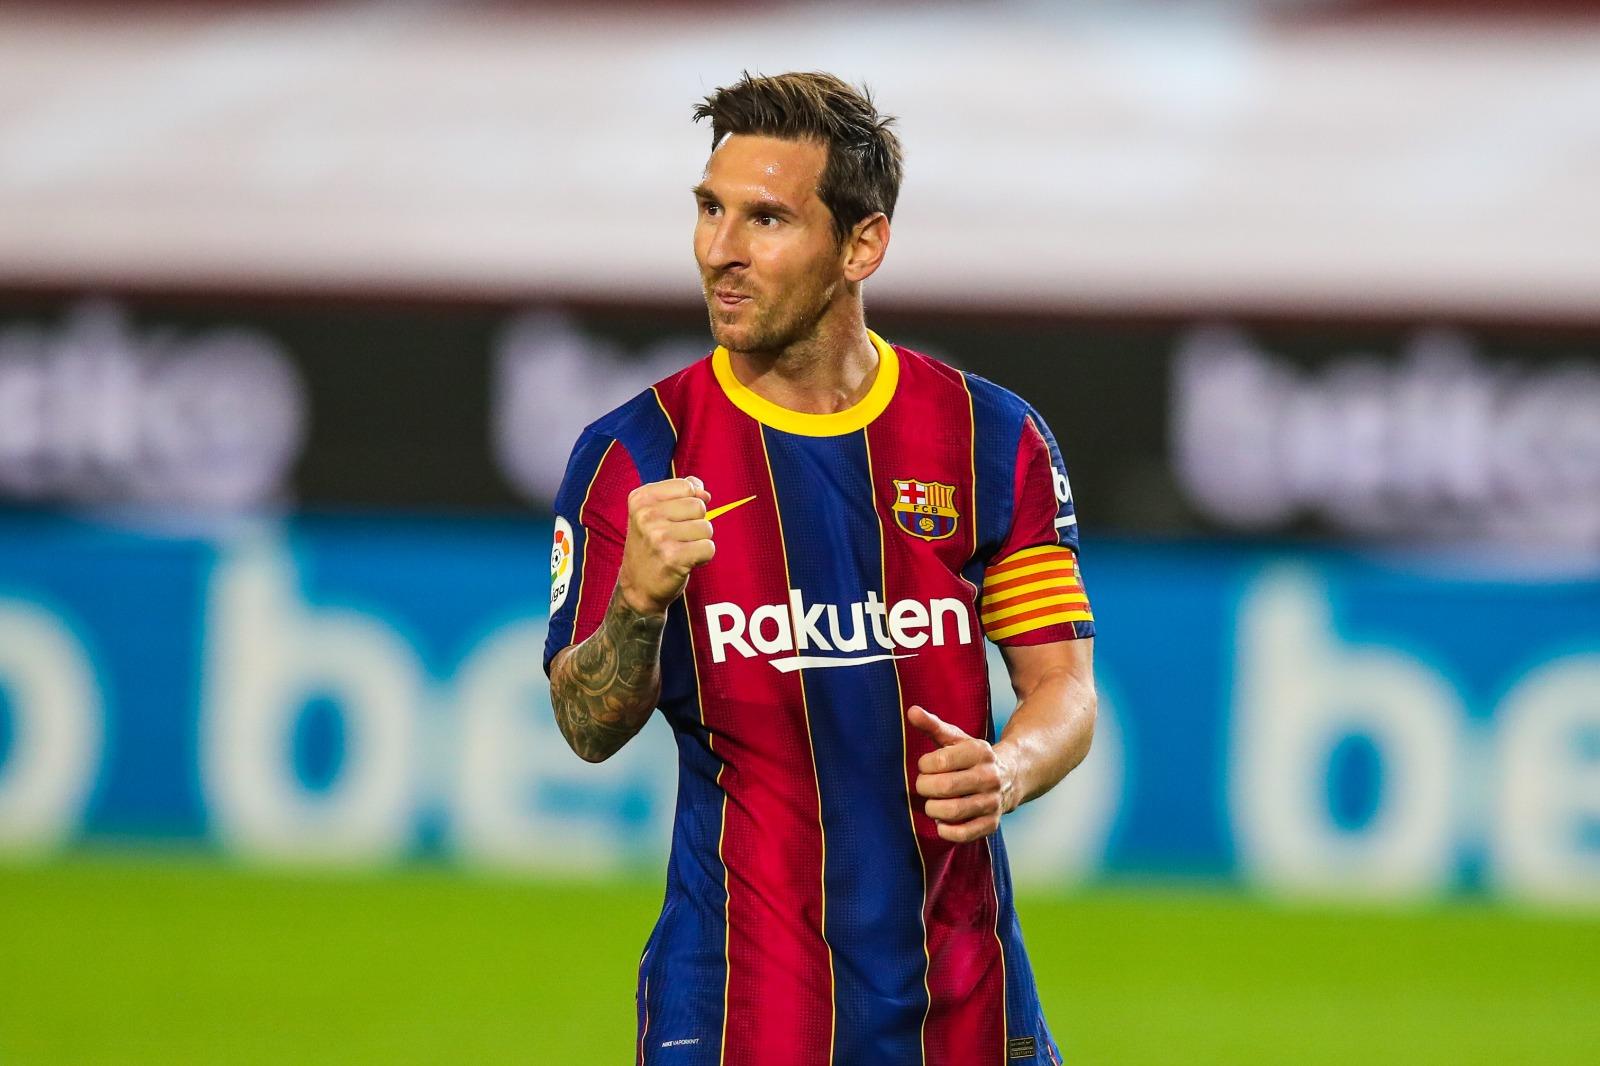 Arranca el camino de Messi hacia la gran revancha